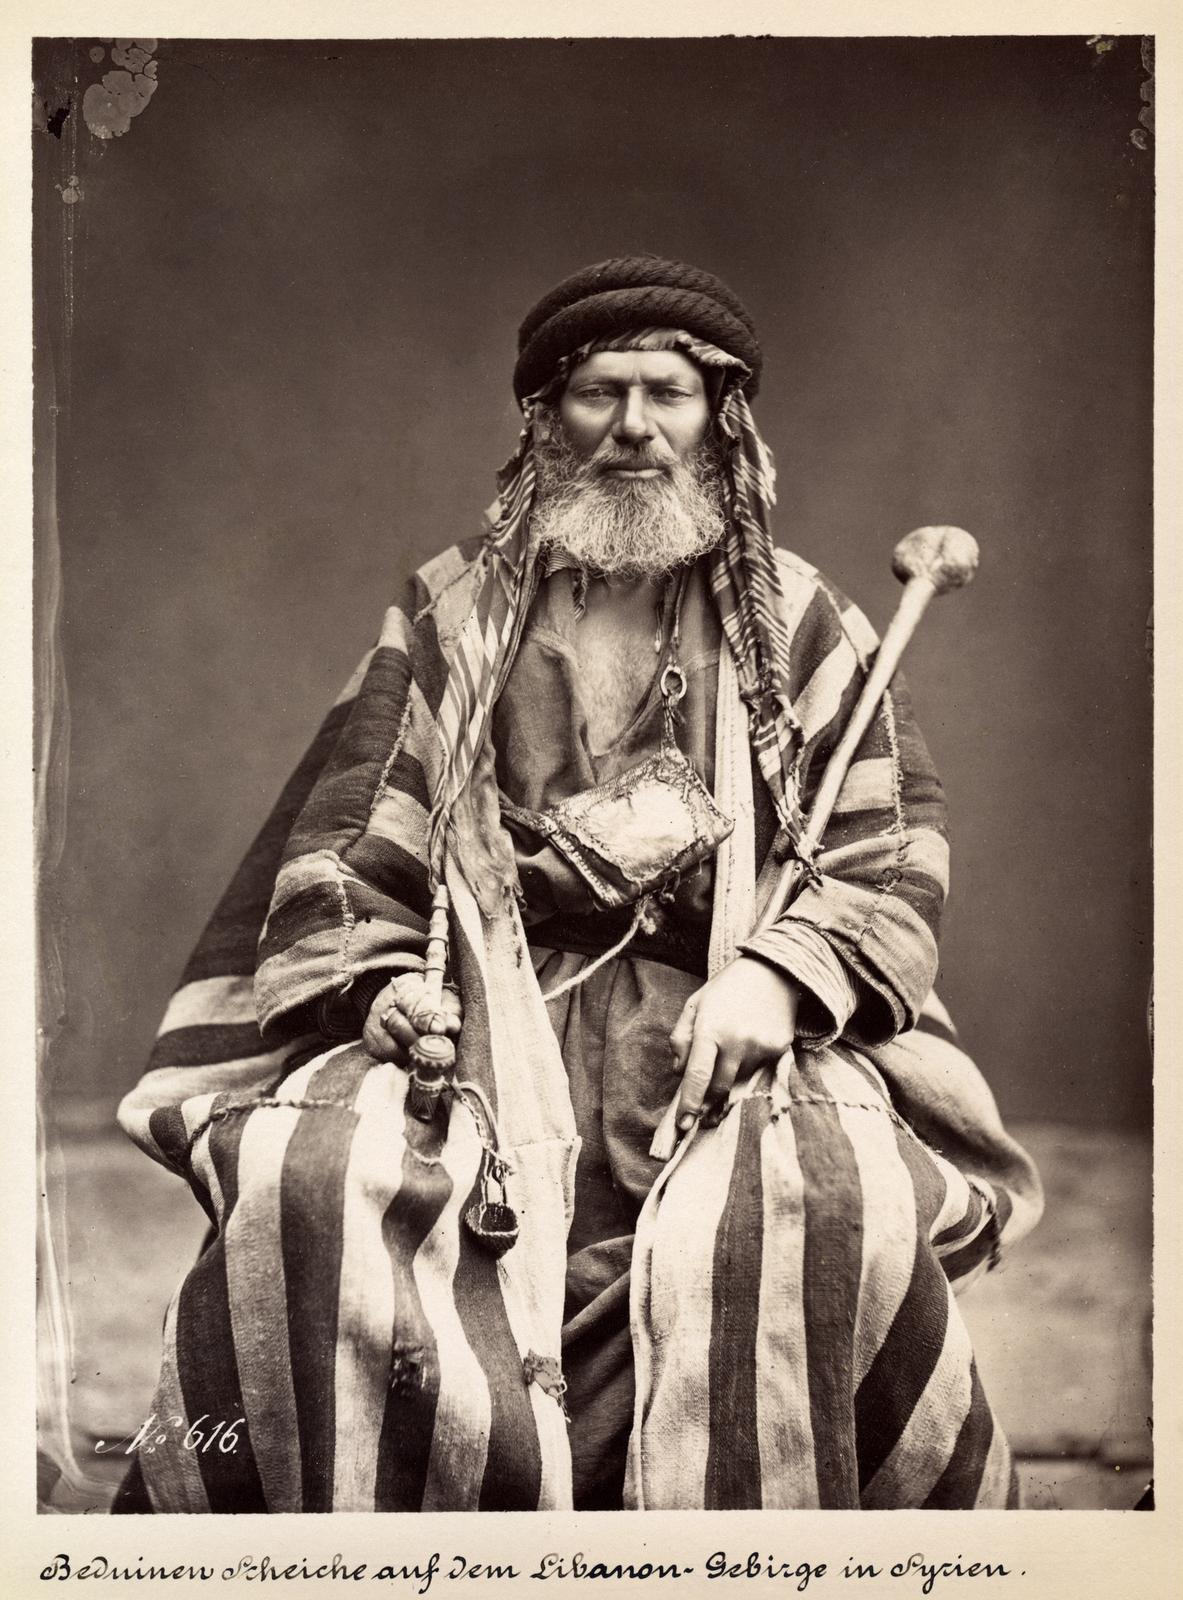 Bedouin sheik, Lebanon. Please like http://www.facebook.com/RagDollMagazine and follow @RagDollMagBlog @priscillacita